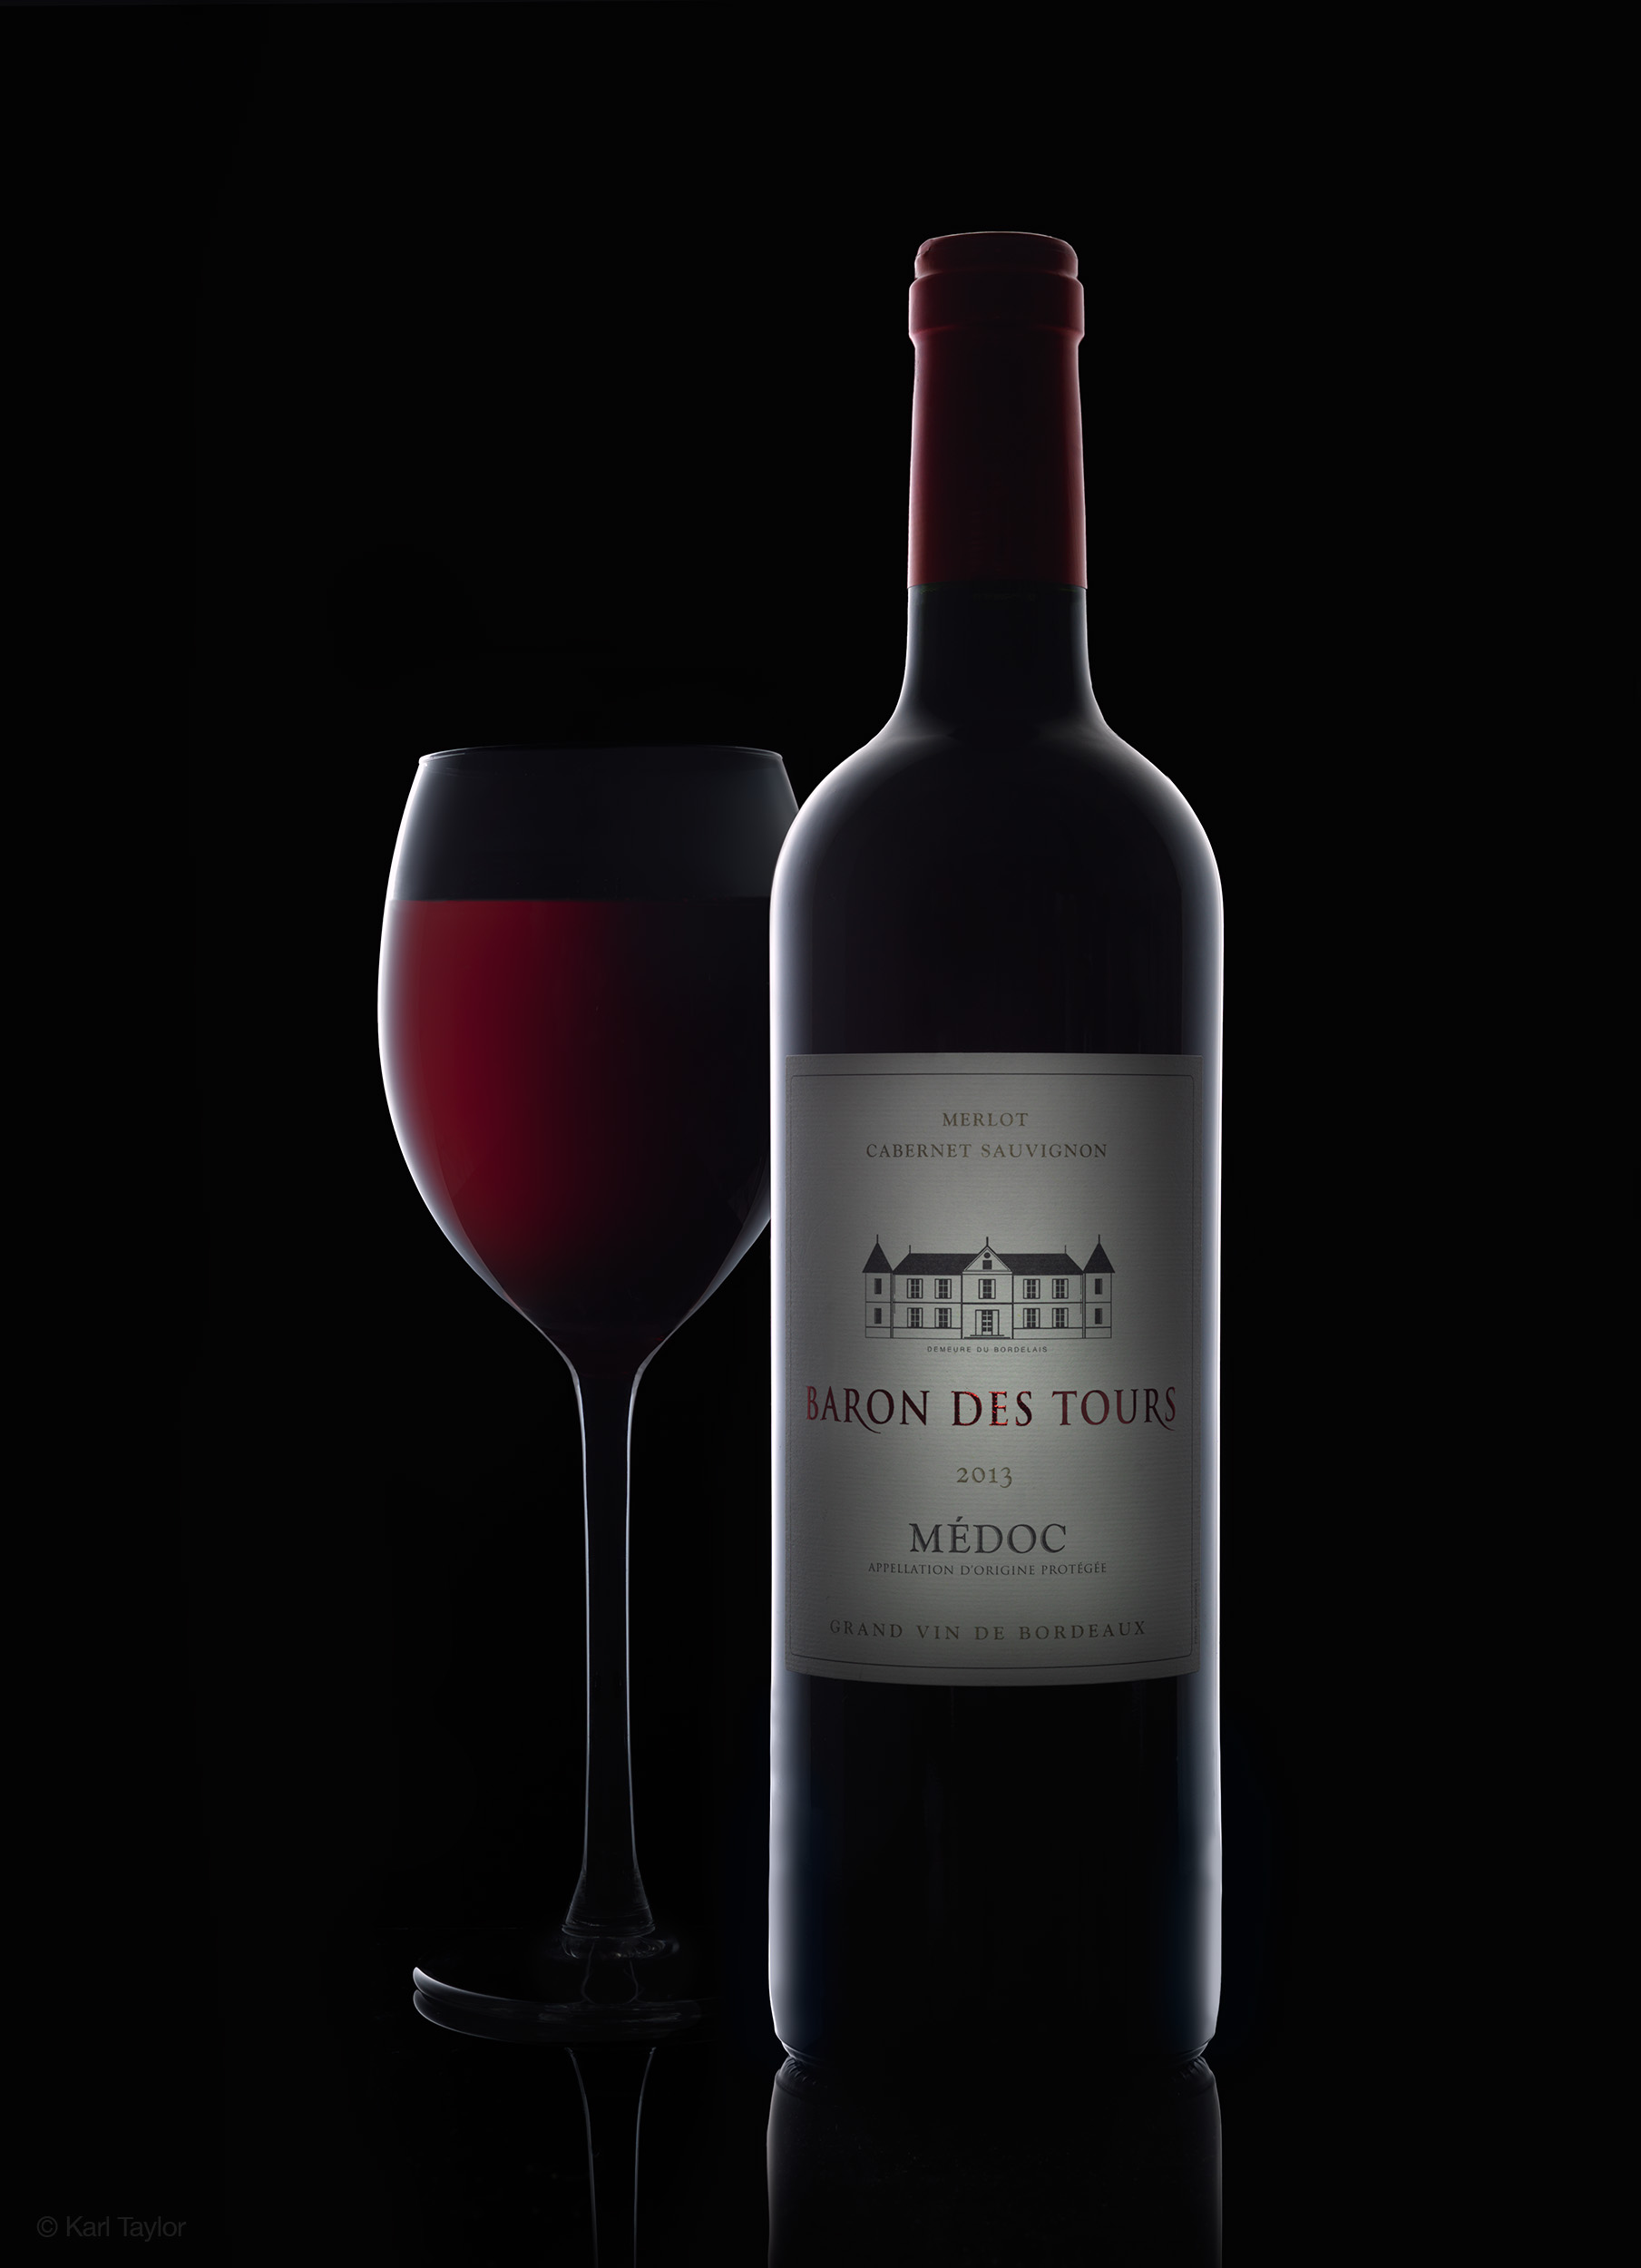 wine_Karl_Taylor_SS.jpg